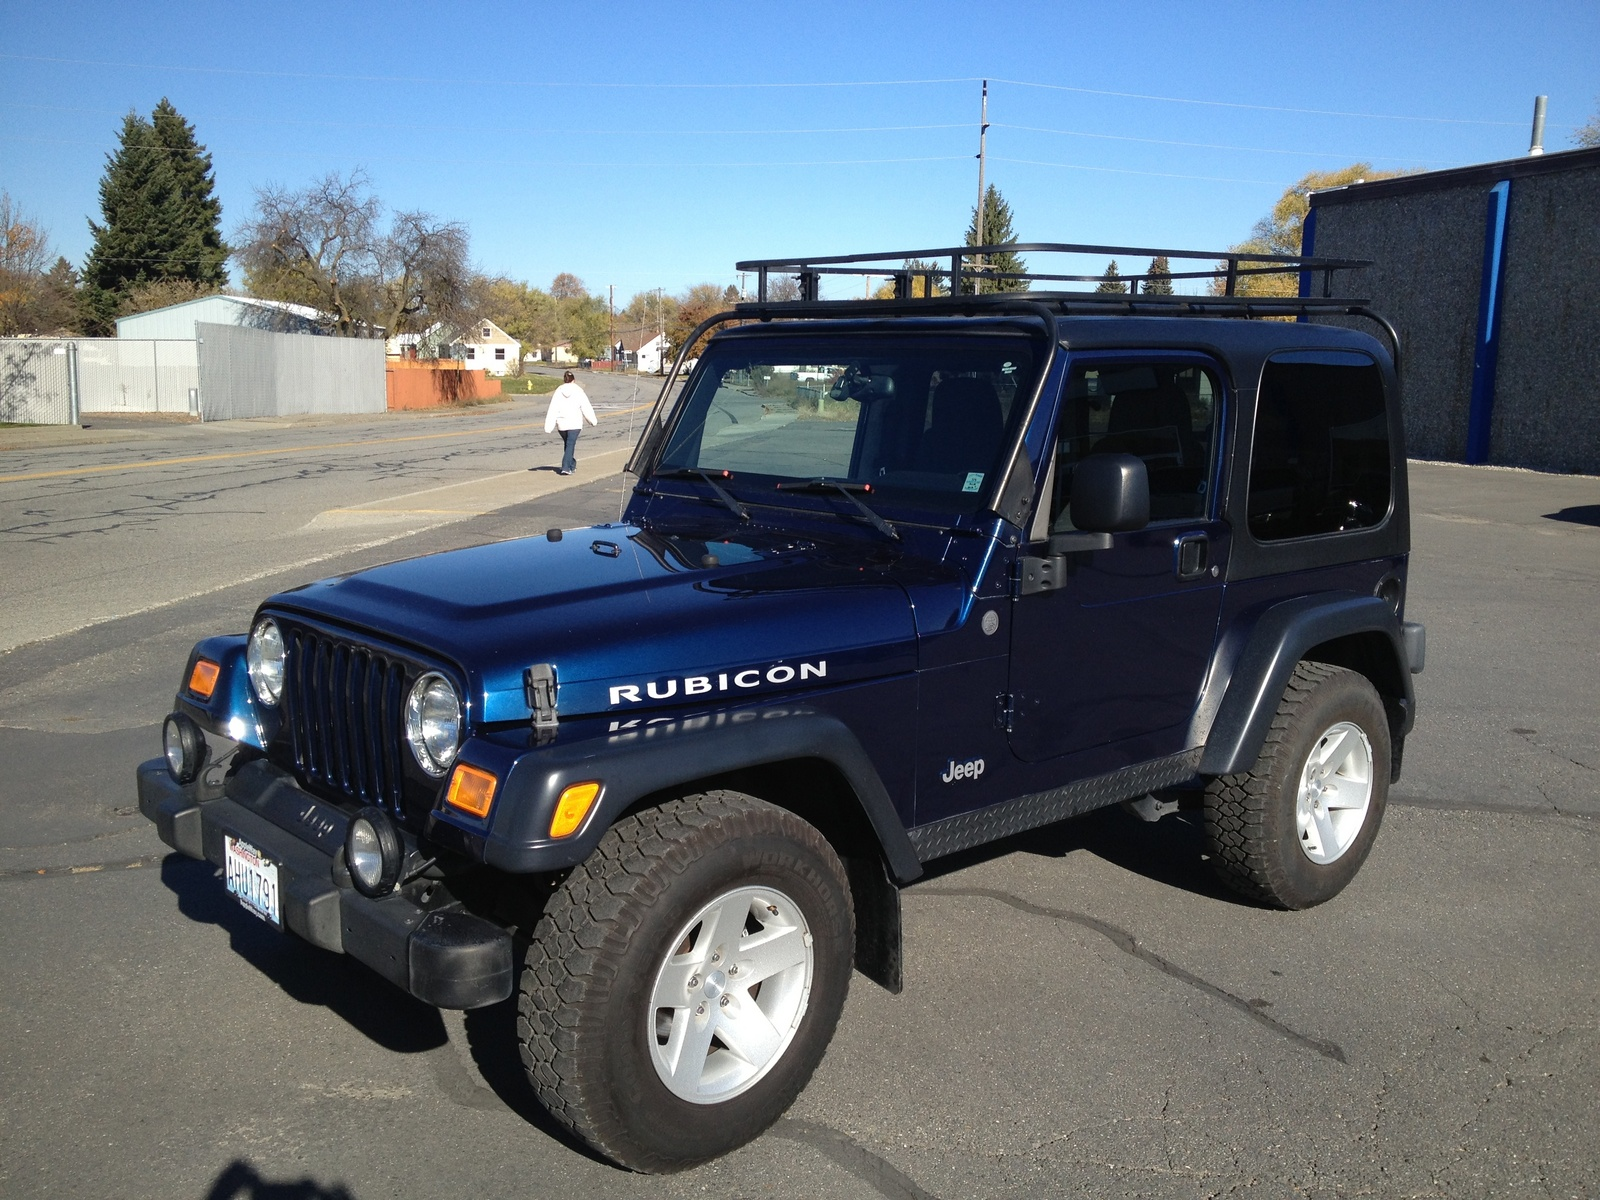 Picture of 2006 jeep wrangler rubicon exterior - 2004 Jeep Wrangler Pictures Cargurus